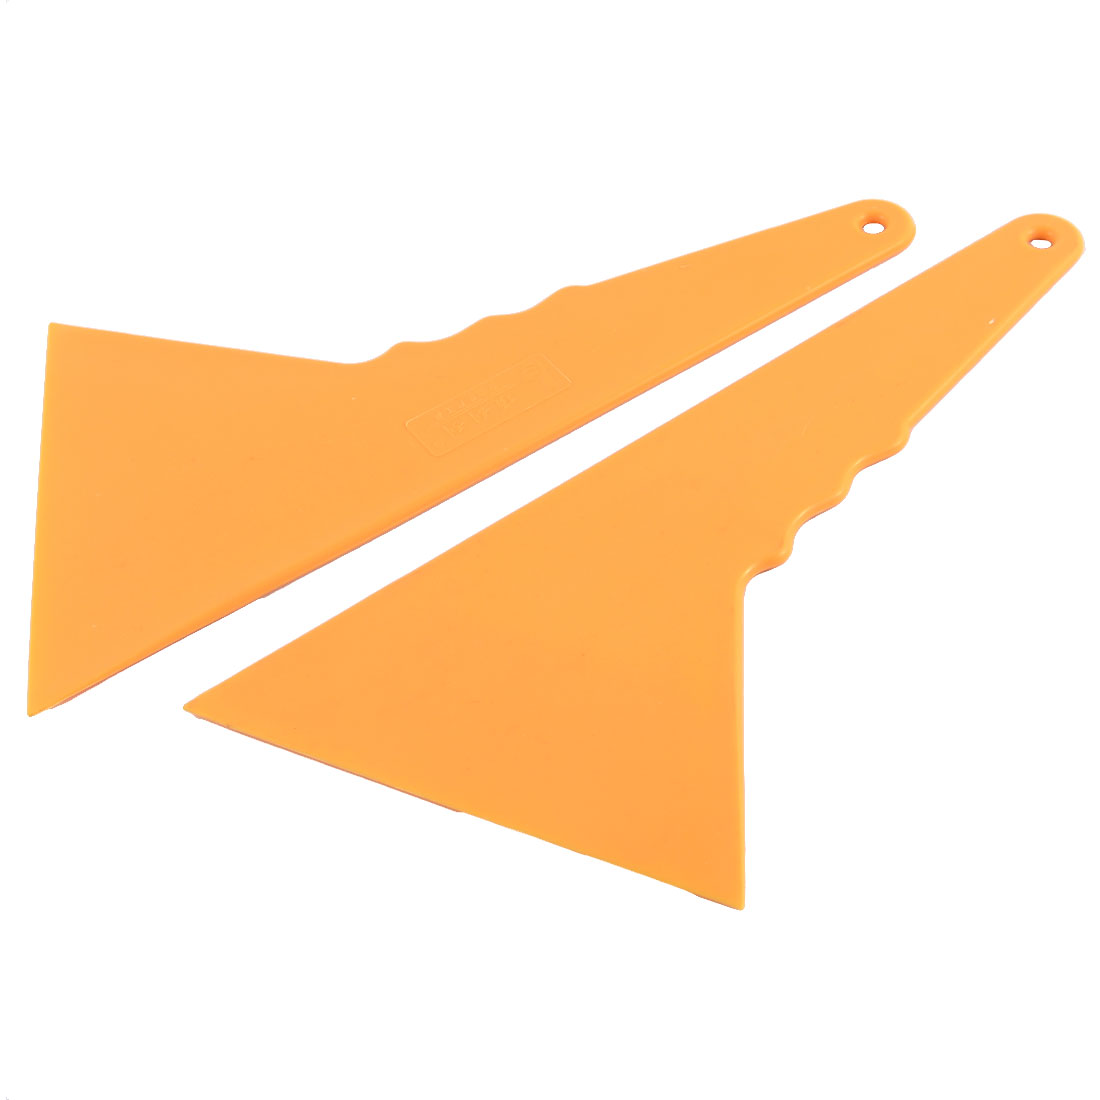 Household Plastic Handle Smooth Corners Cars Glass Wall Scraper Tool Orange 2PCS